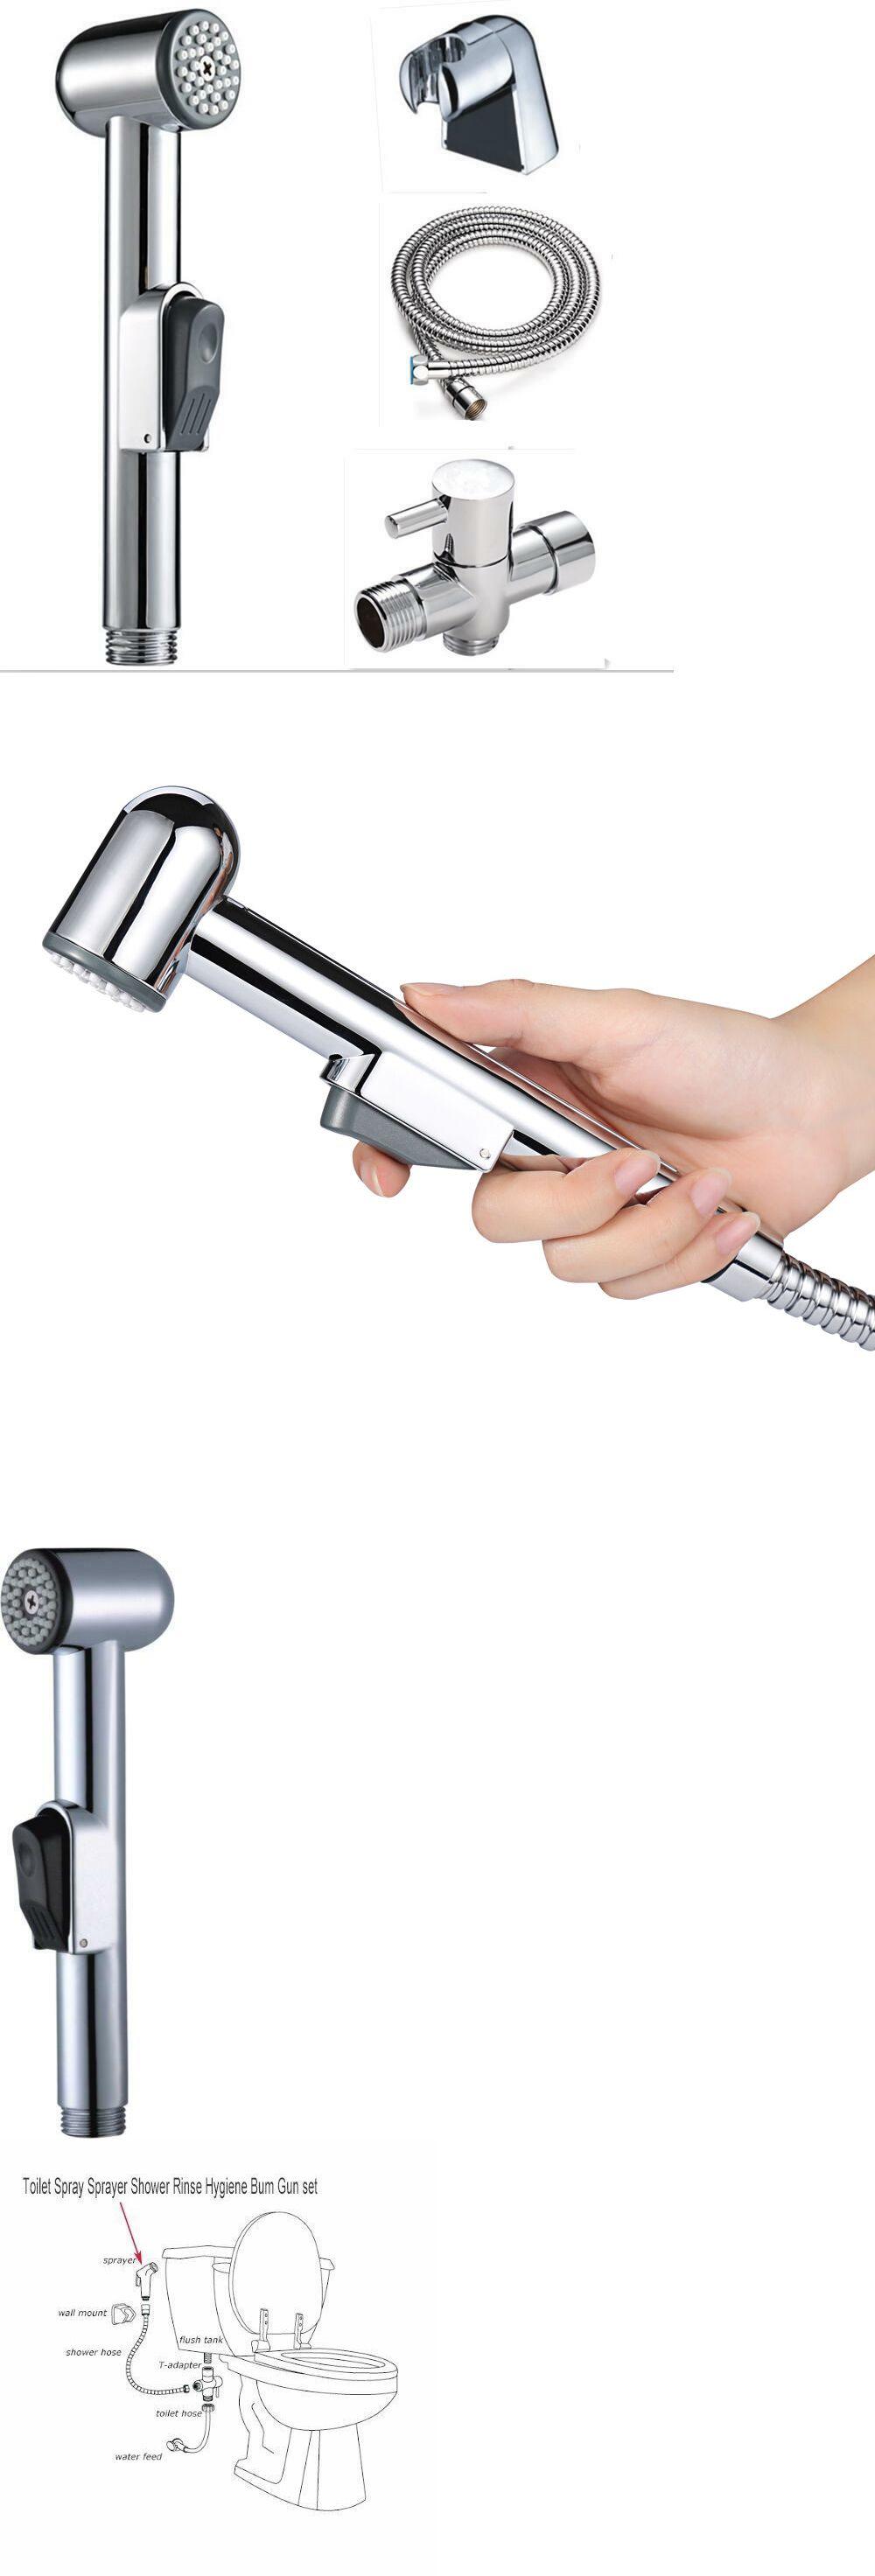 Bidets And Toilet Attachments 101405 Bidet Sprayer Toilet Shattaf